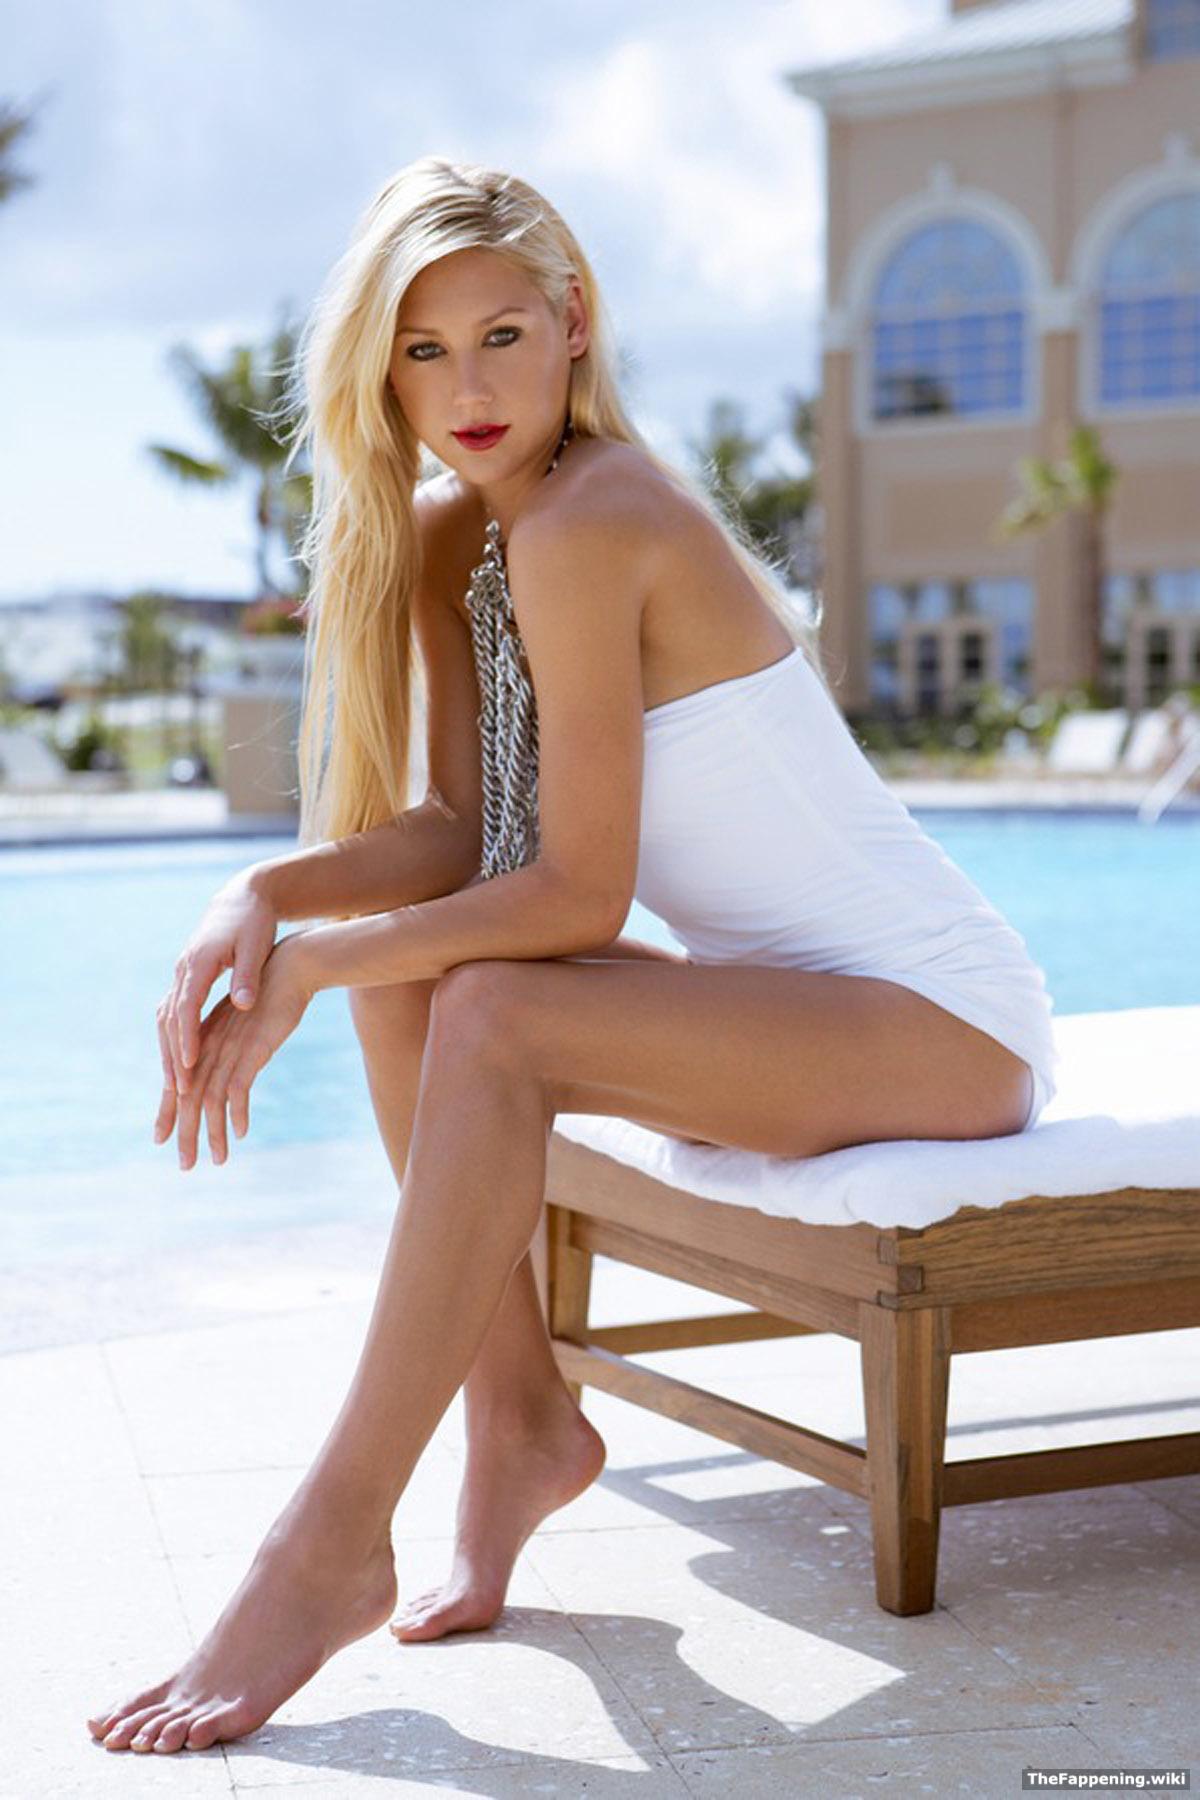 Chrissy Teigen, Anna Kournikova Apparent Nude Photos Leaked On Twitter | Pictures.Dot.News